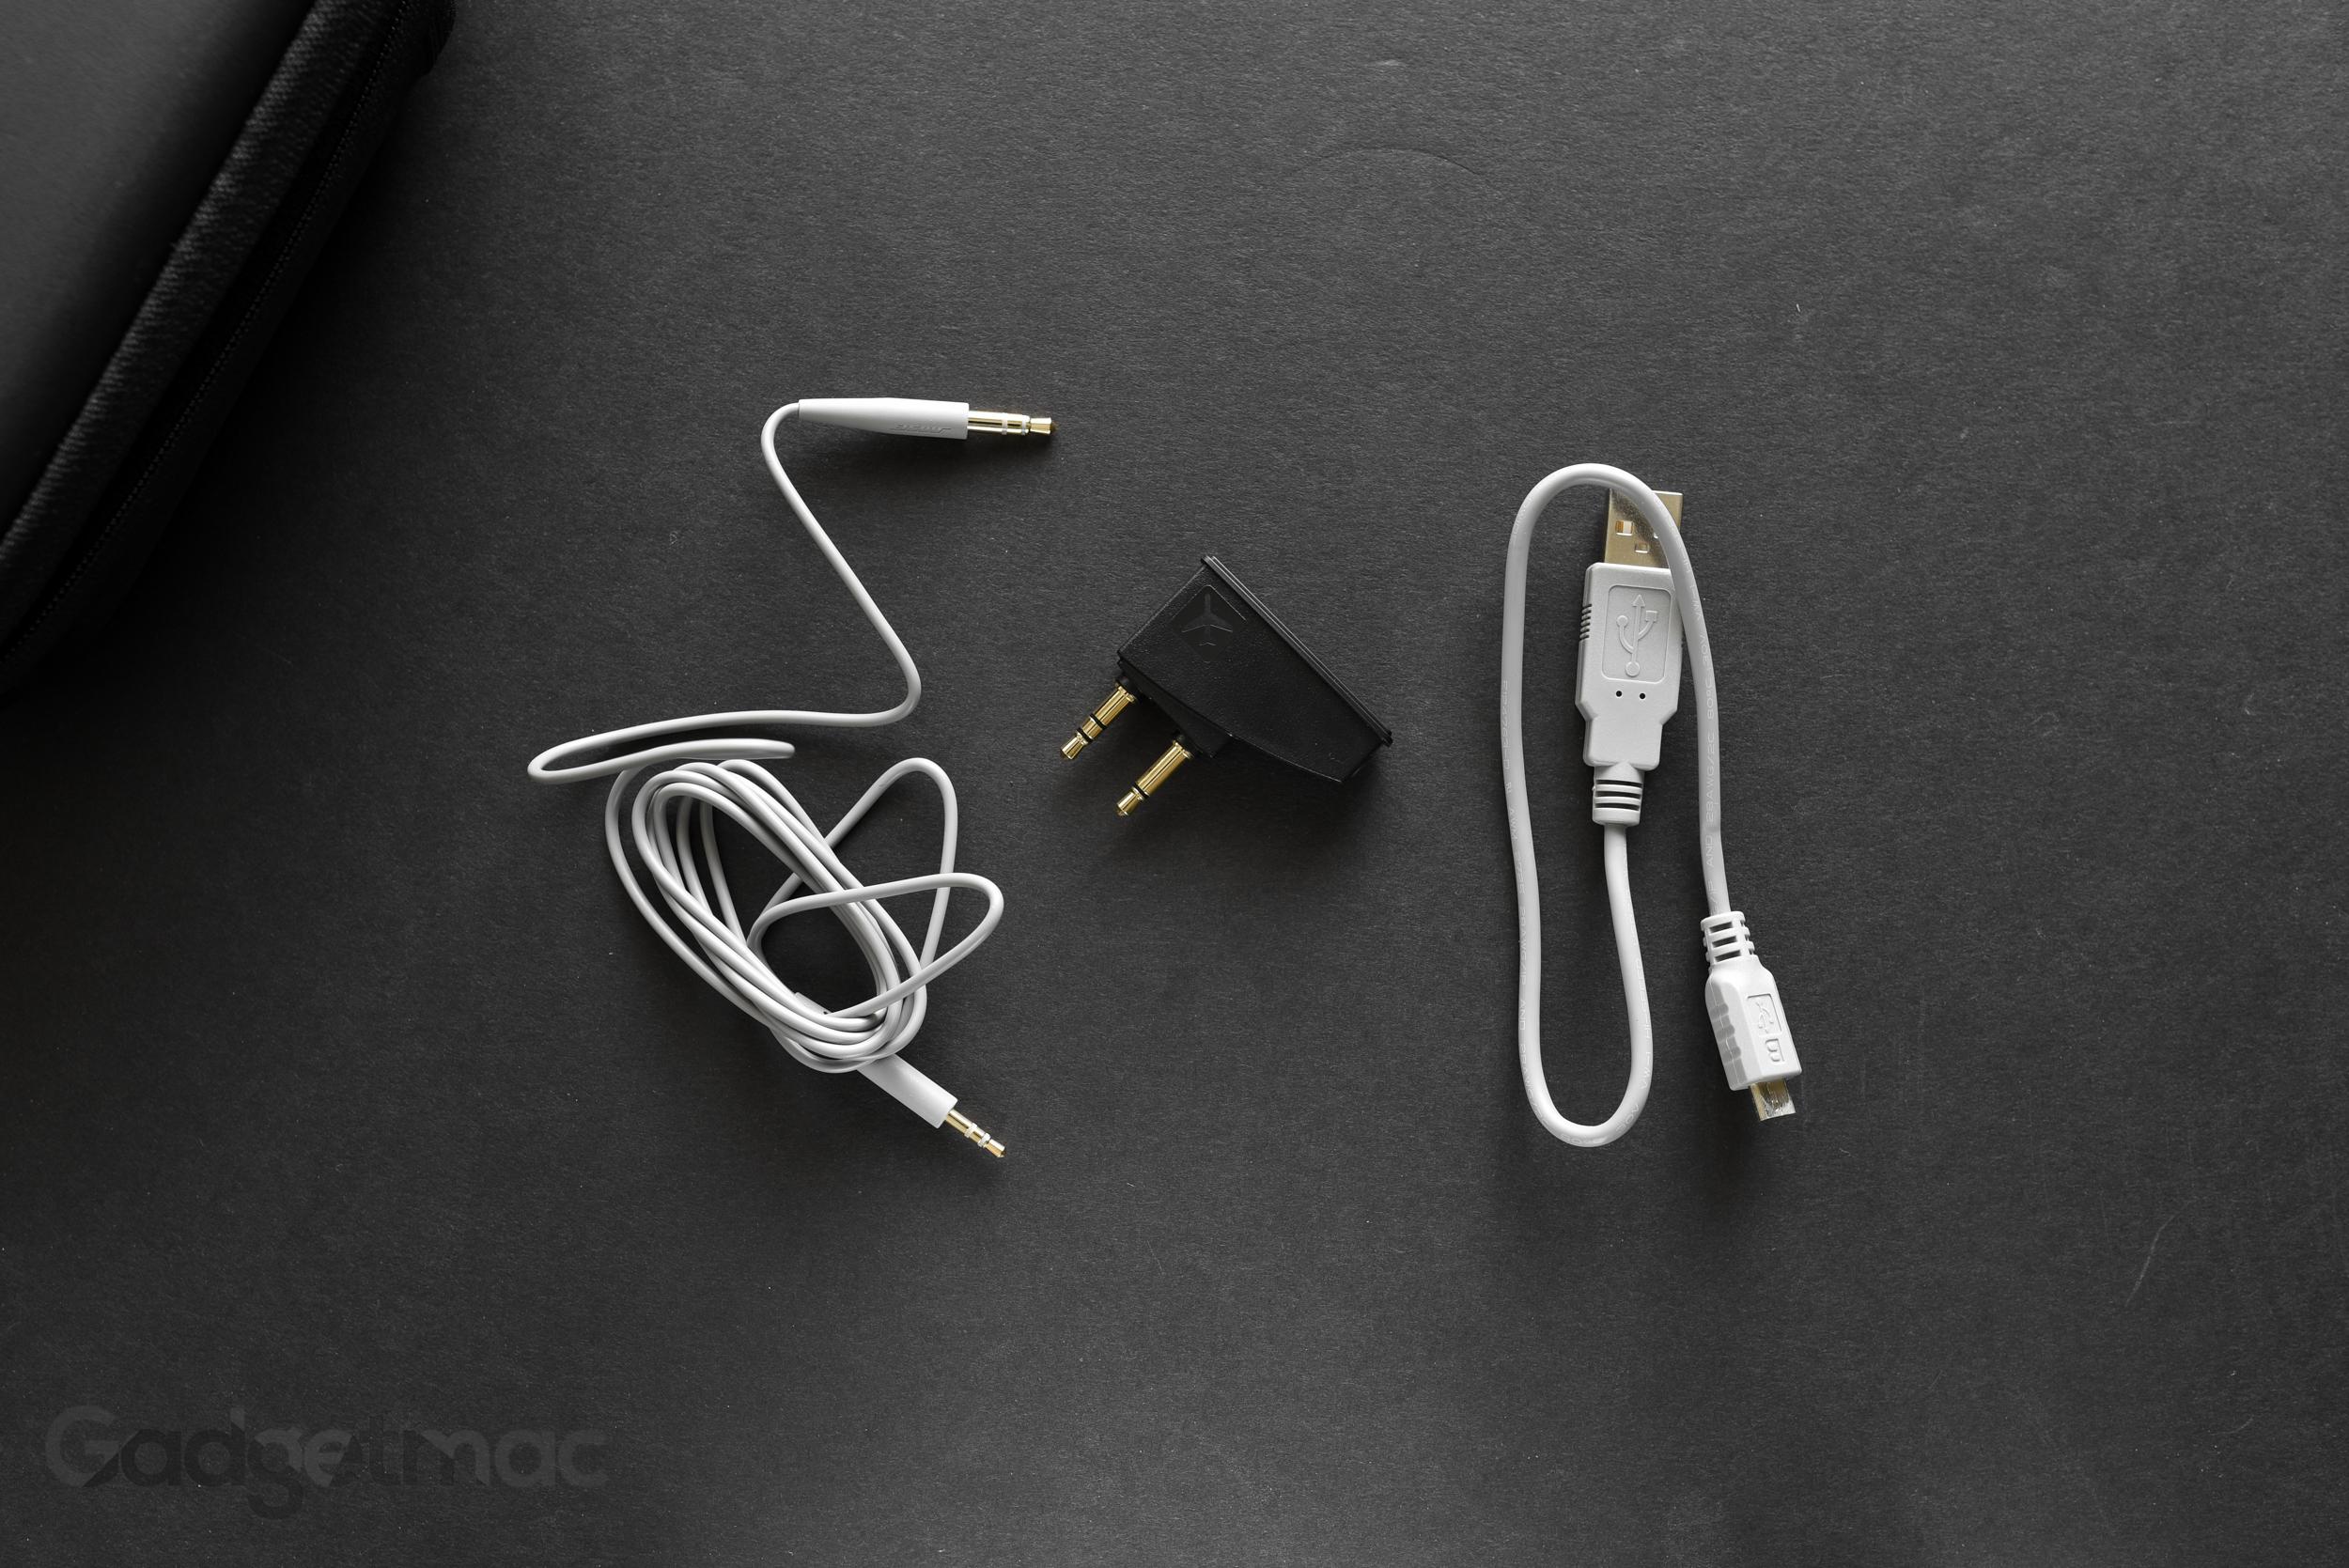 bose-quietcomfort-35-included-accessories.jpg